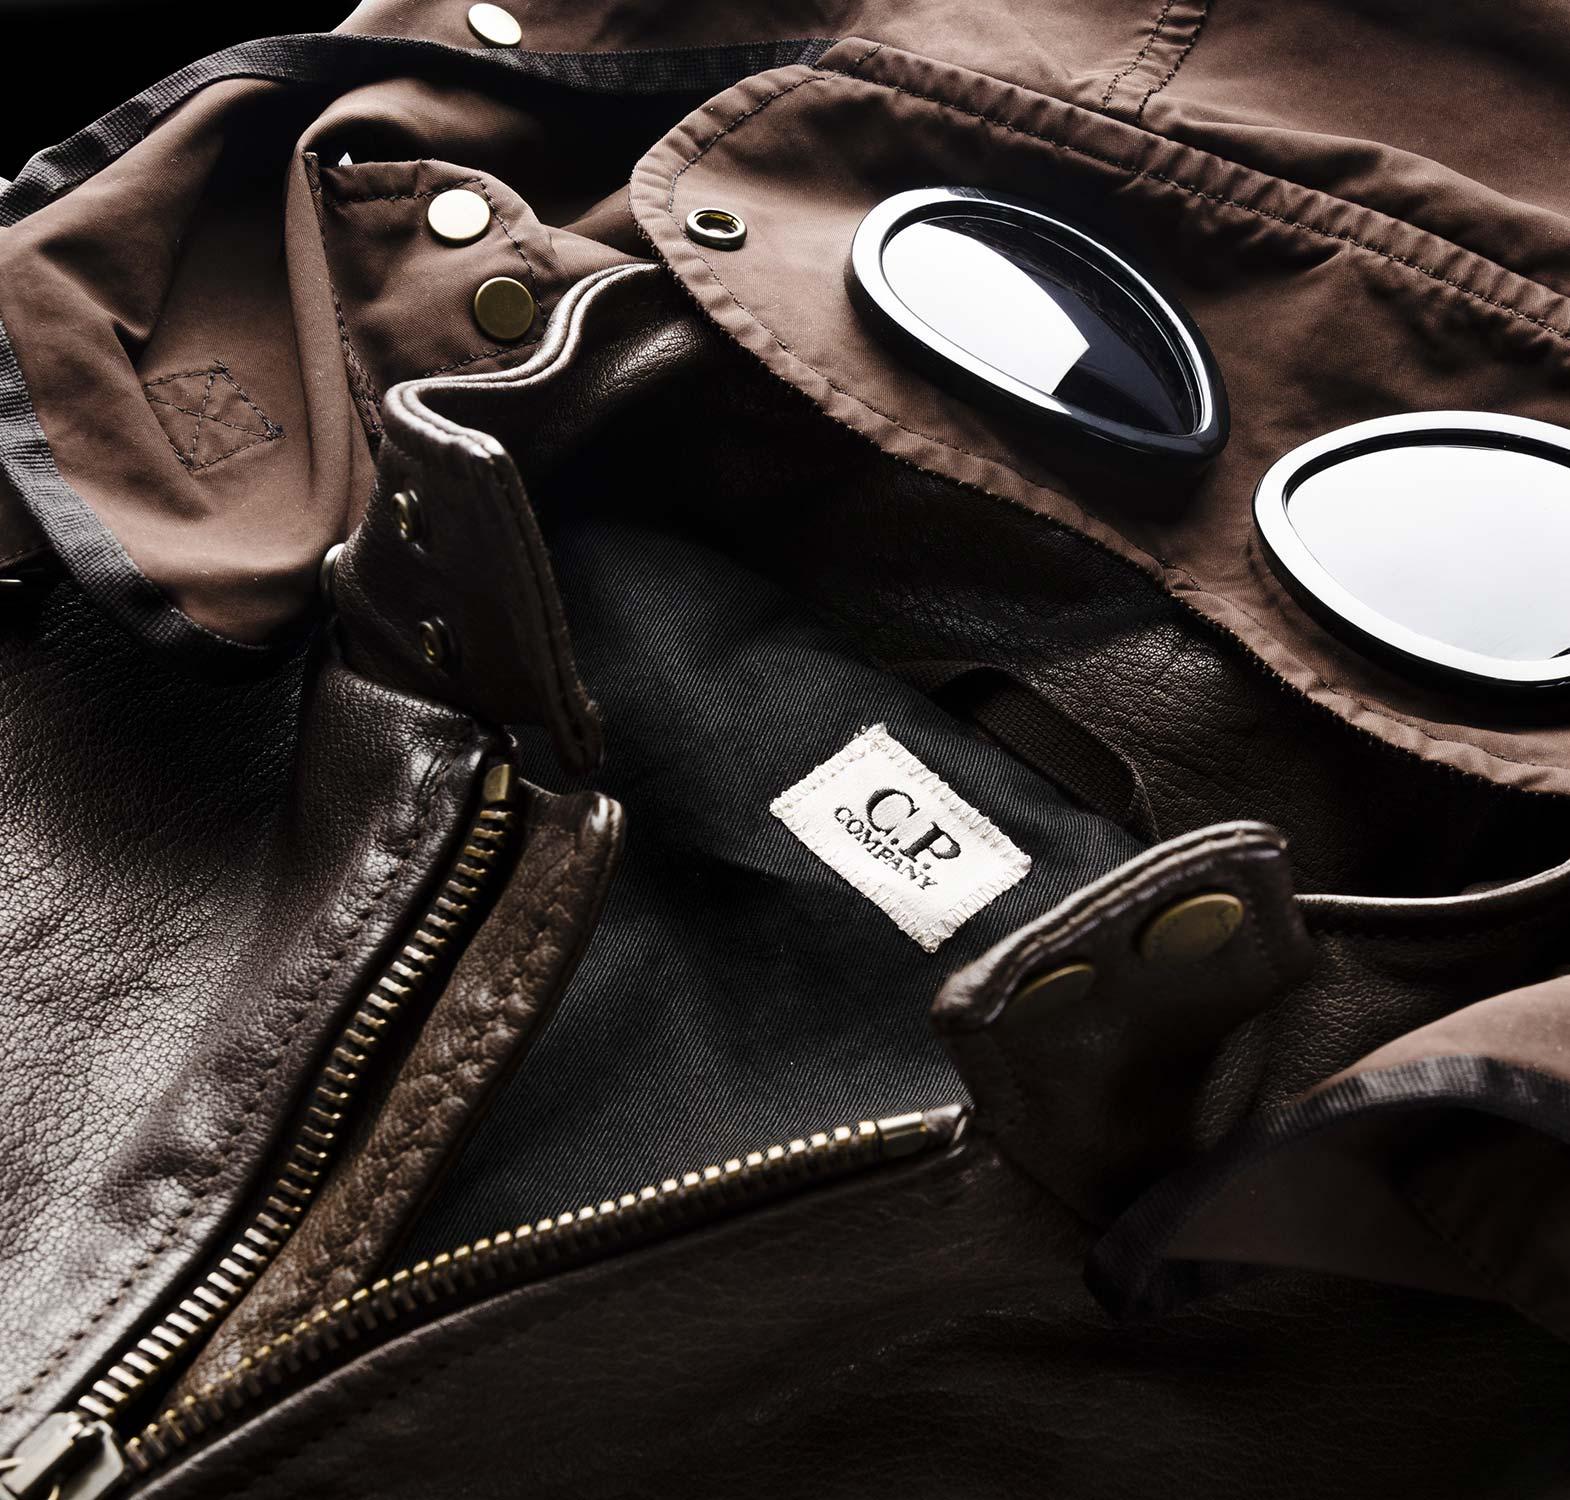 C.p. leather jackets